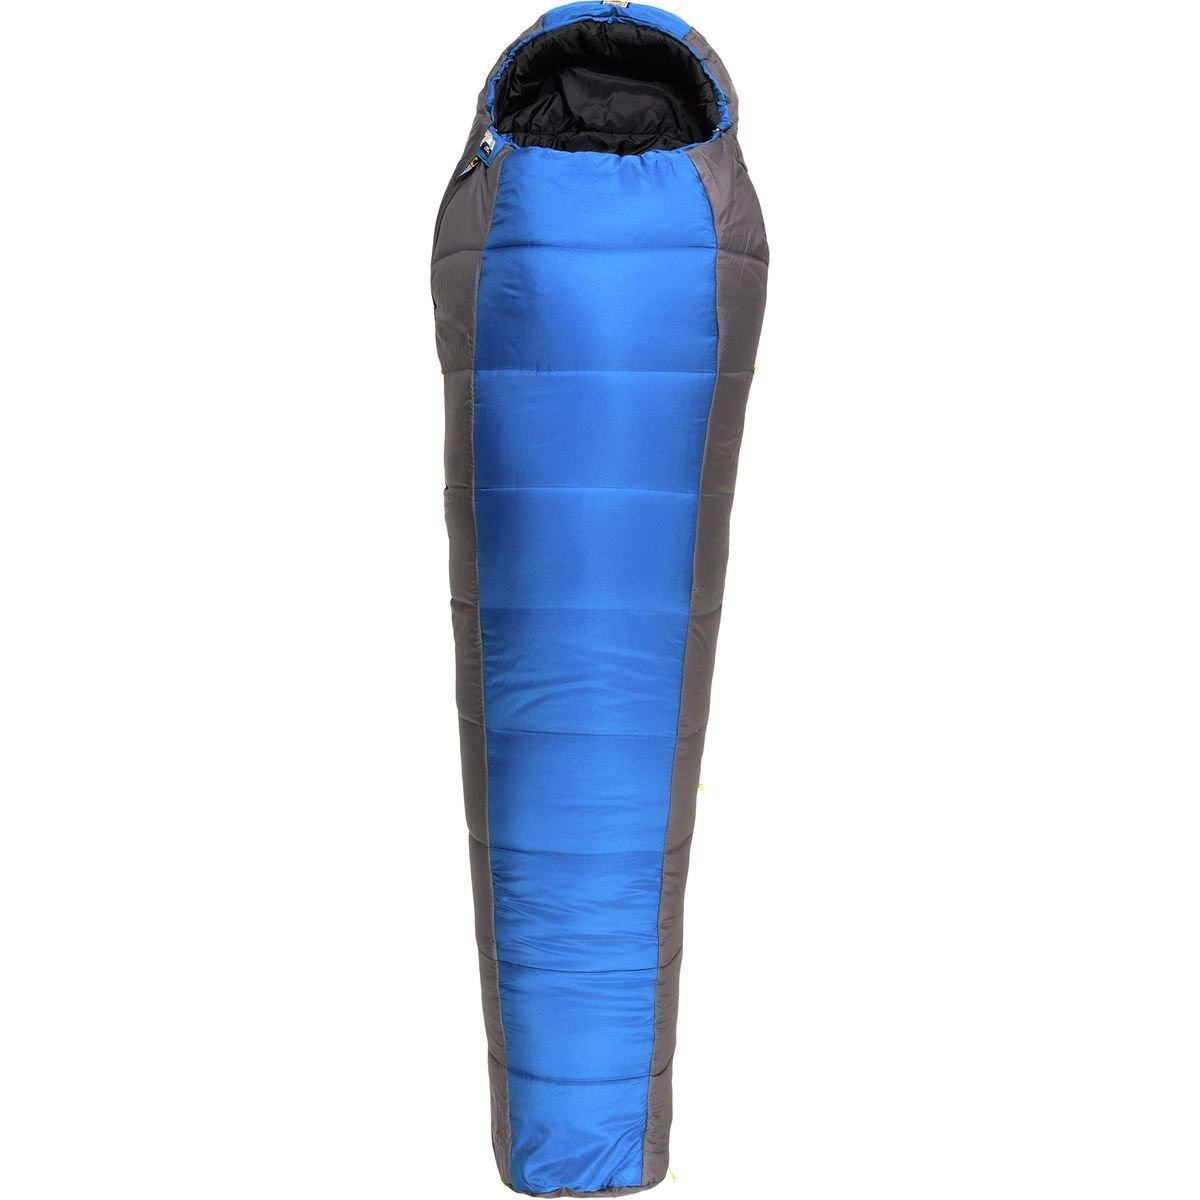 Mountainsmith Crestone Sleeping Bag 0 Degree Synthetic